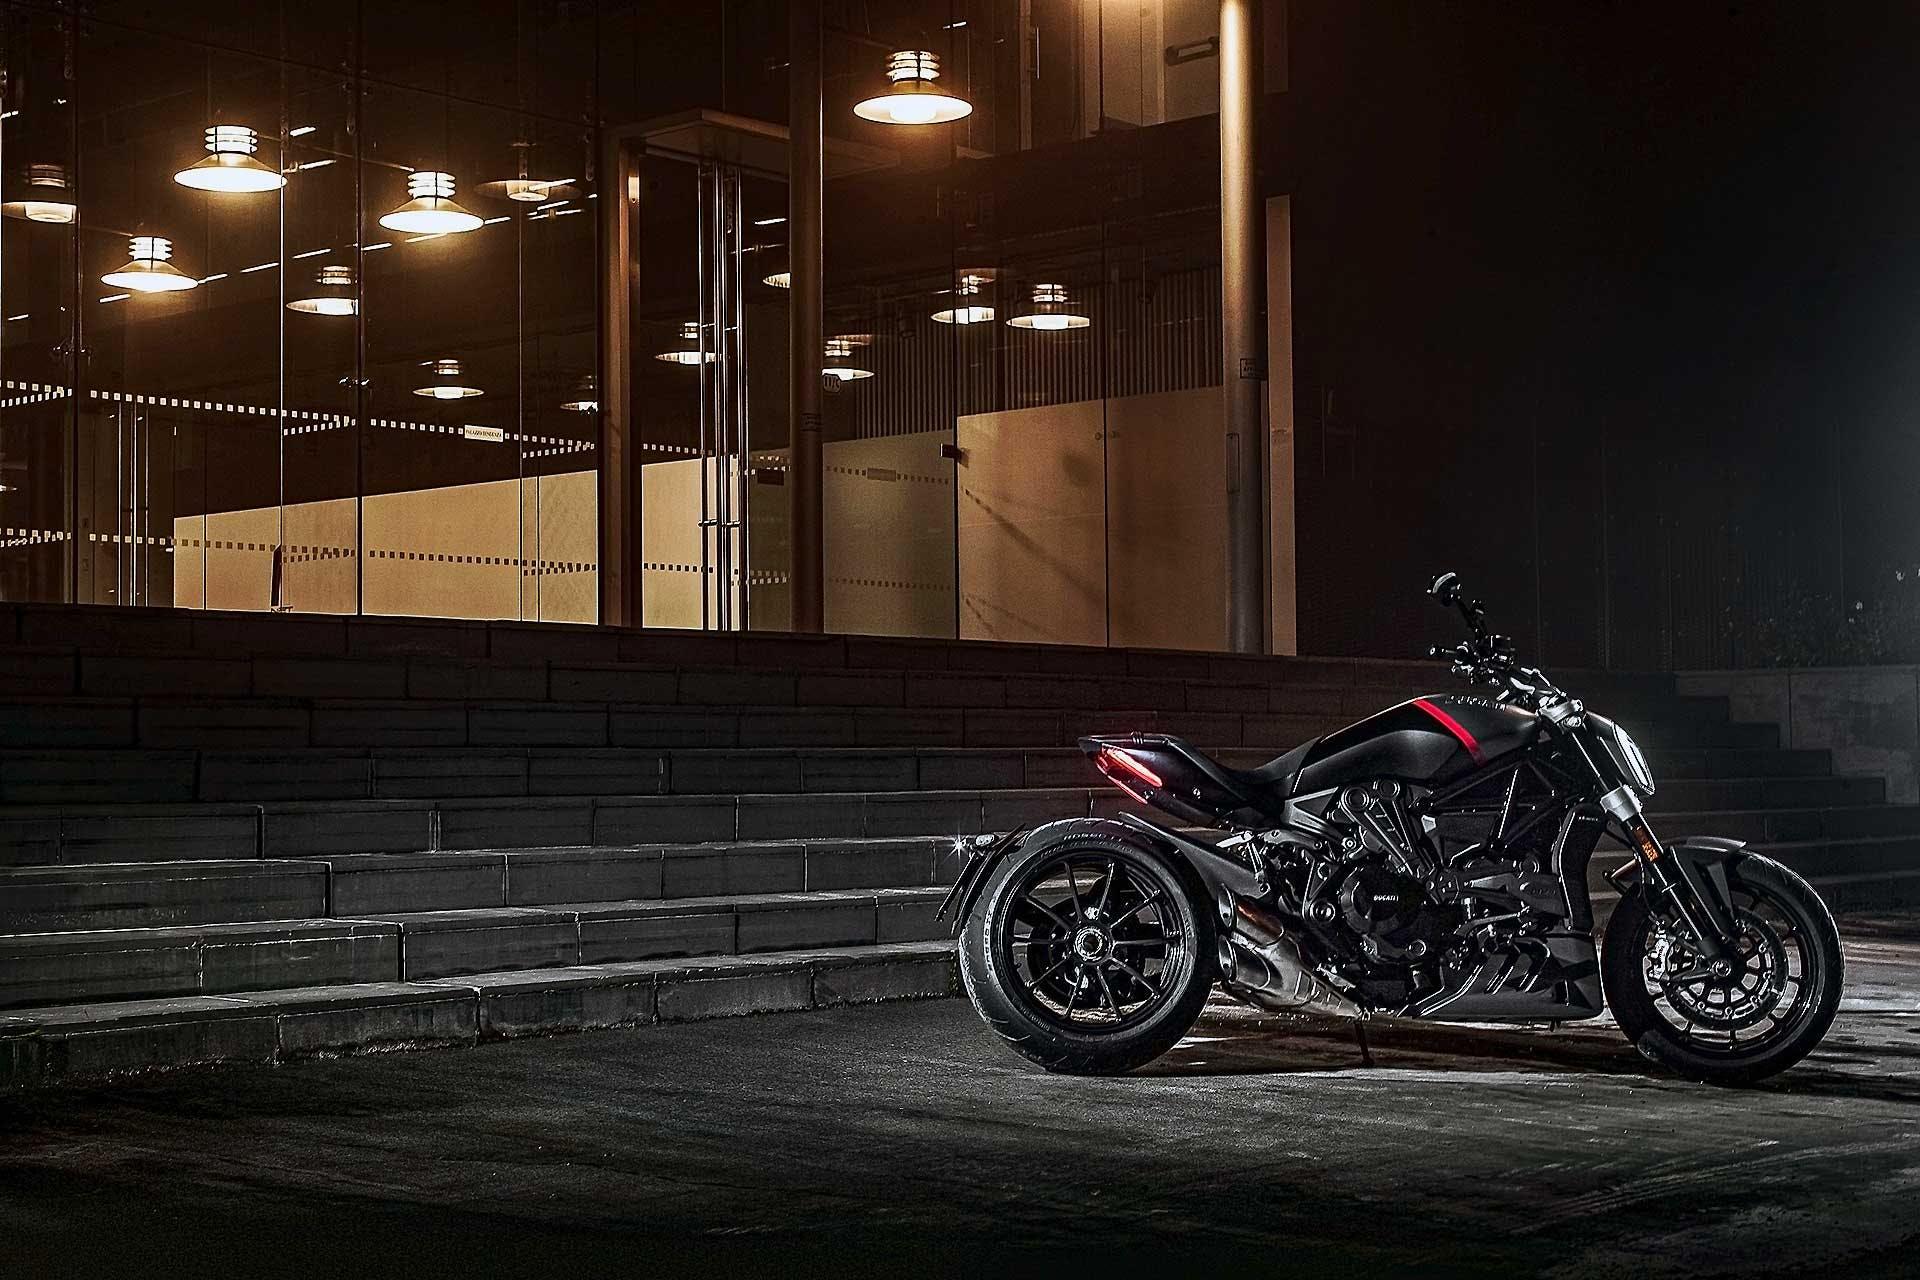 Ducati XDiavel Black Star 2021